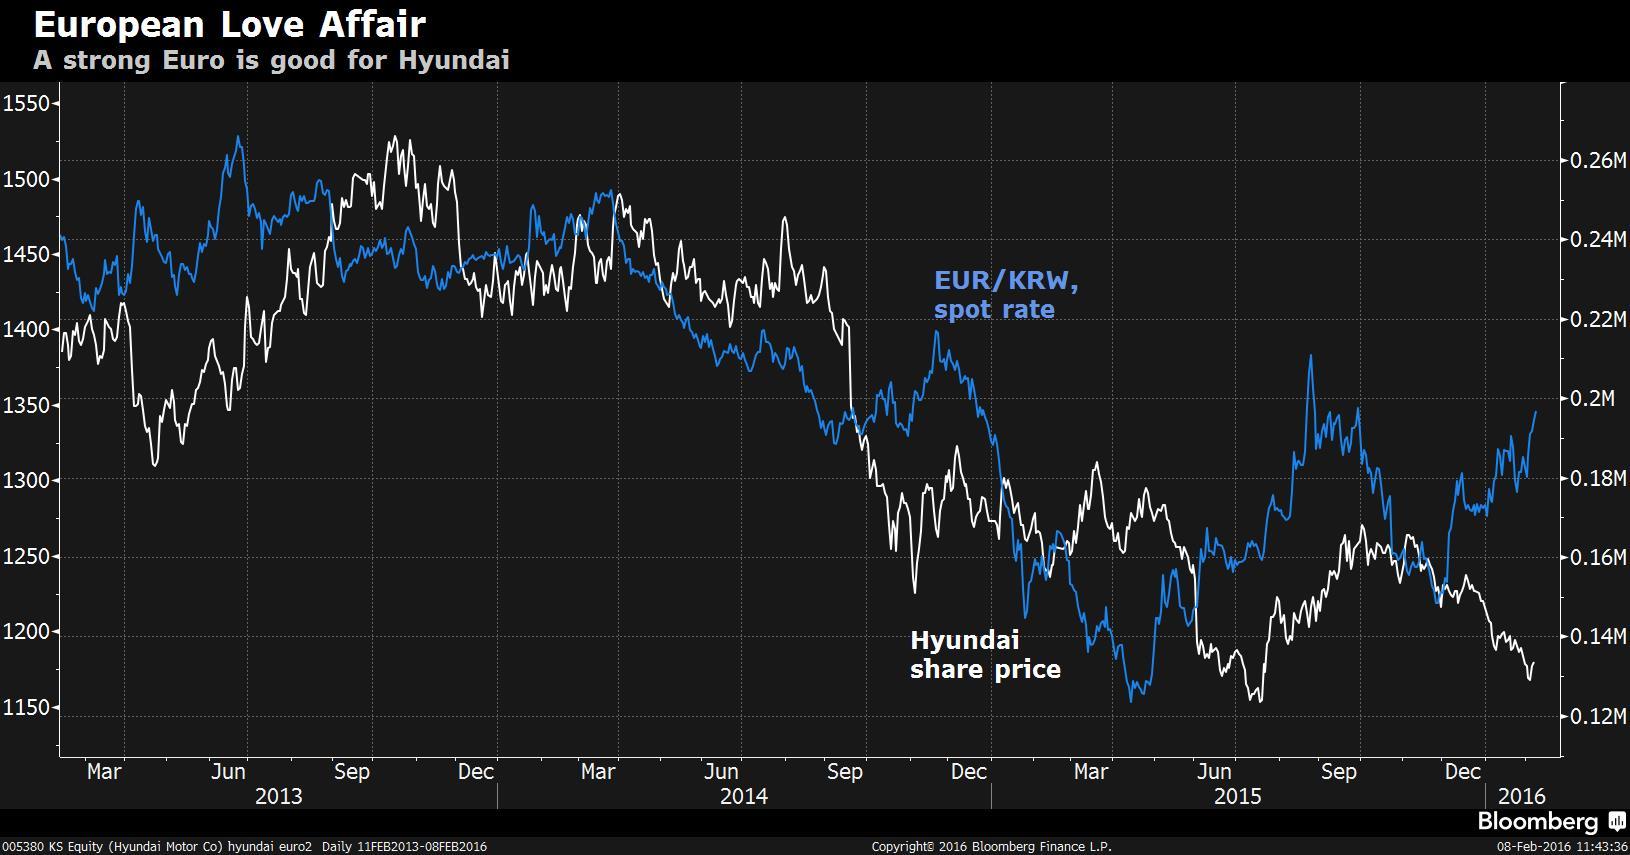 Hyundai share price vs euro